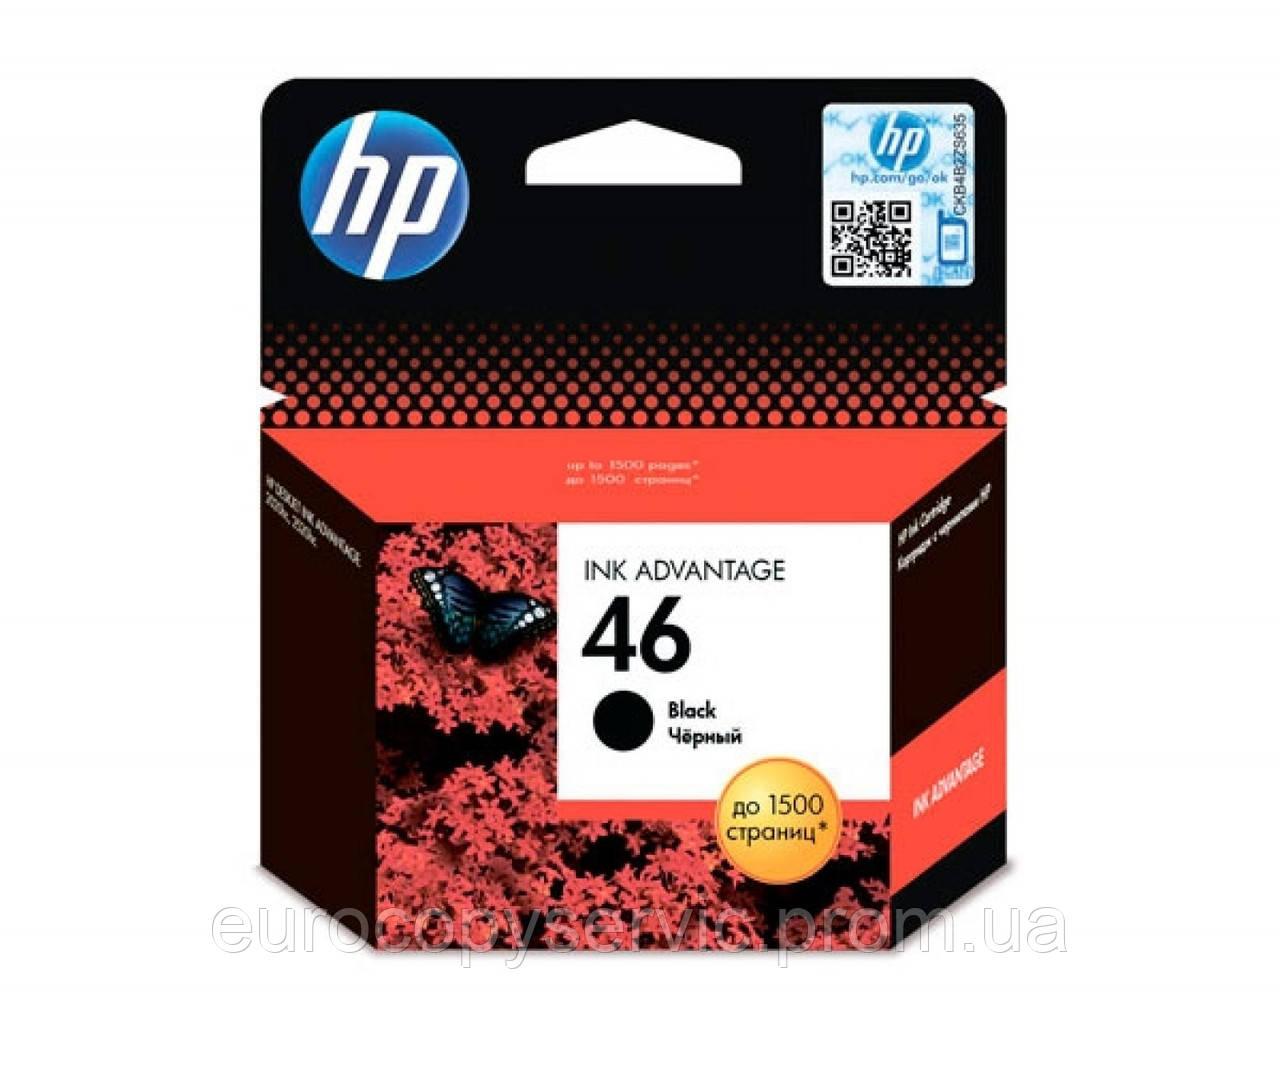 Картридж HP No.46 DeskJet Ink Advantage 2020hc / 2520hc Black (CZ637AE)